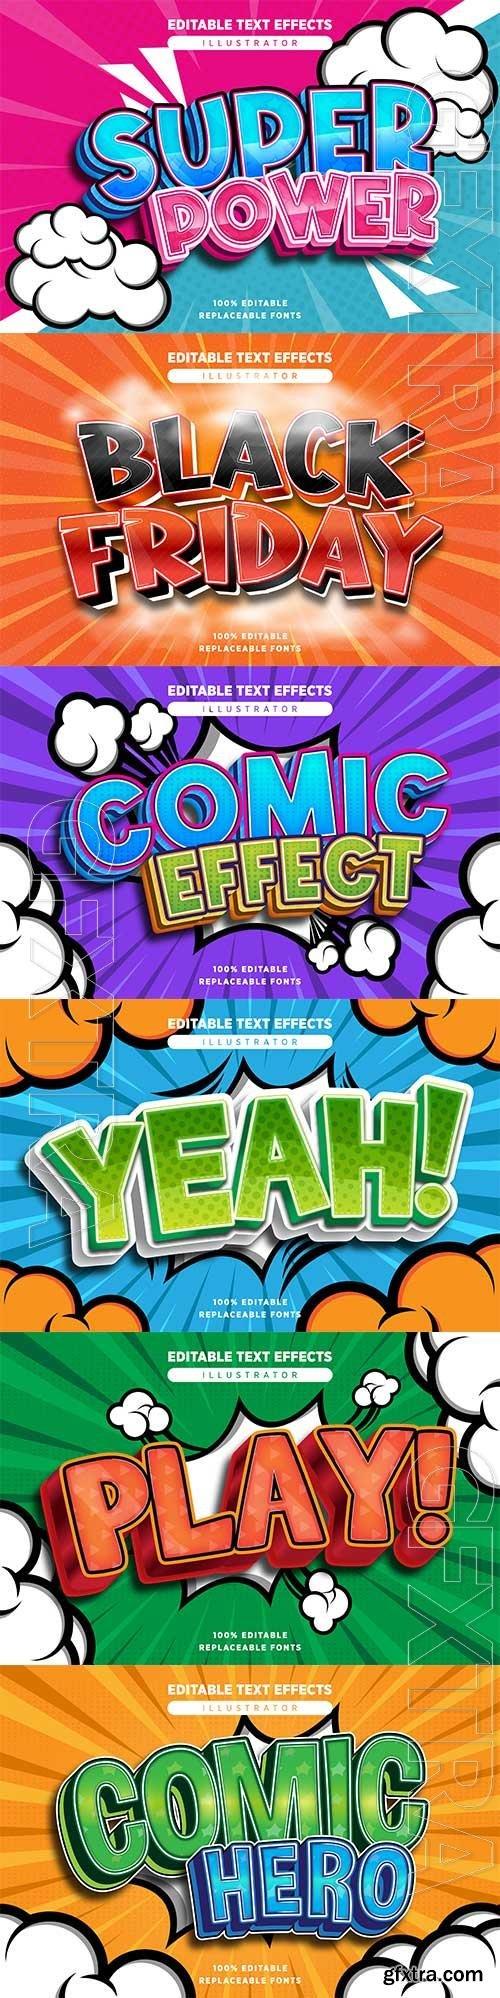 Comic style text effect editable in premium vector